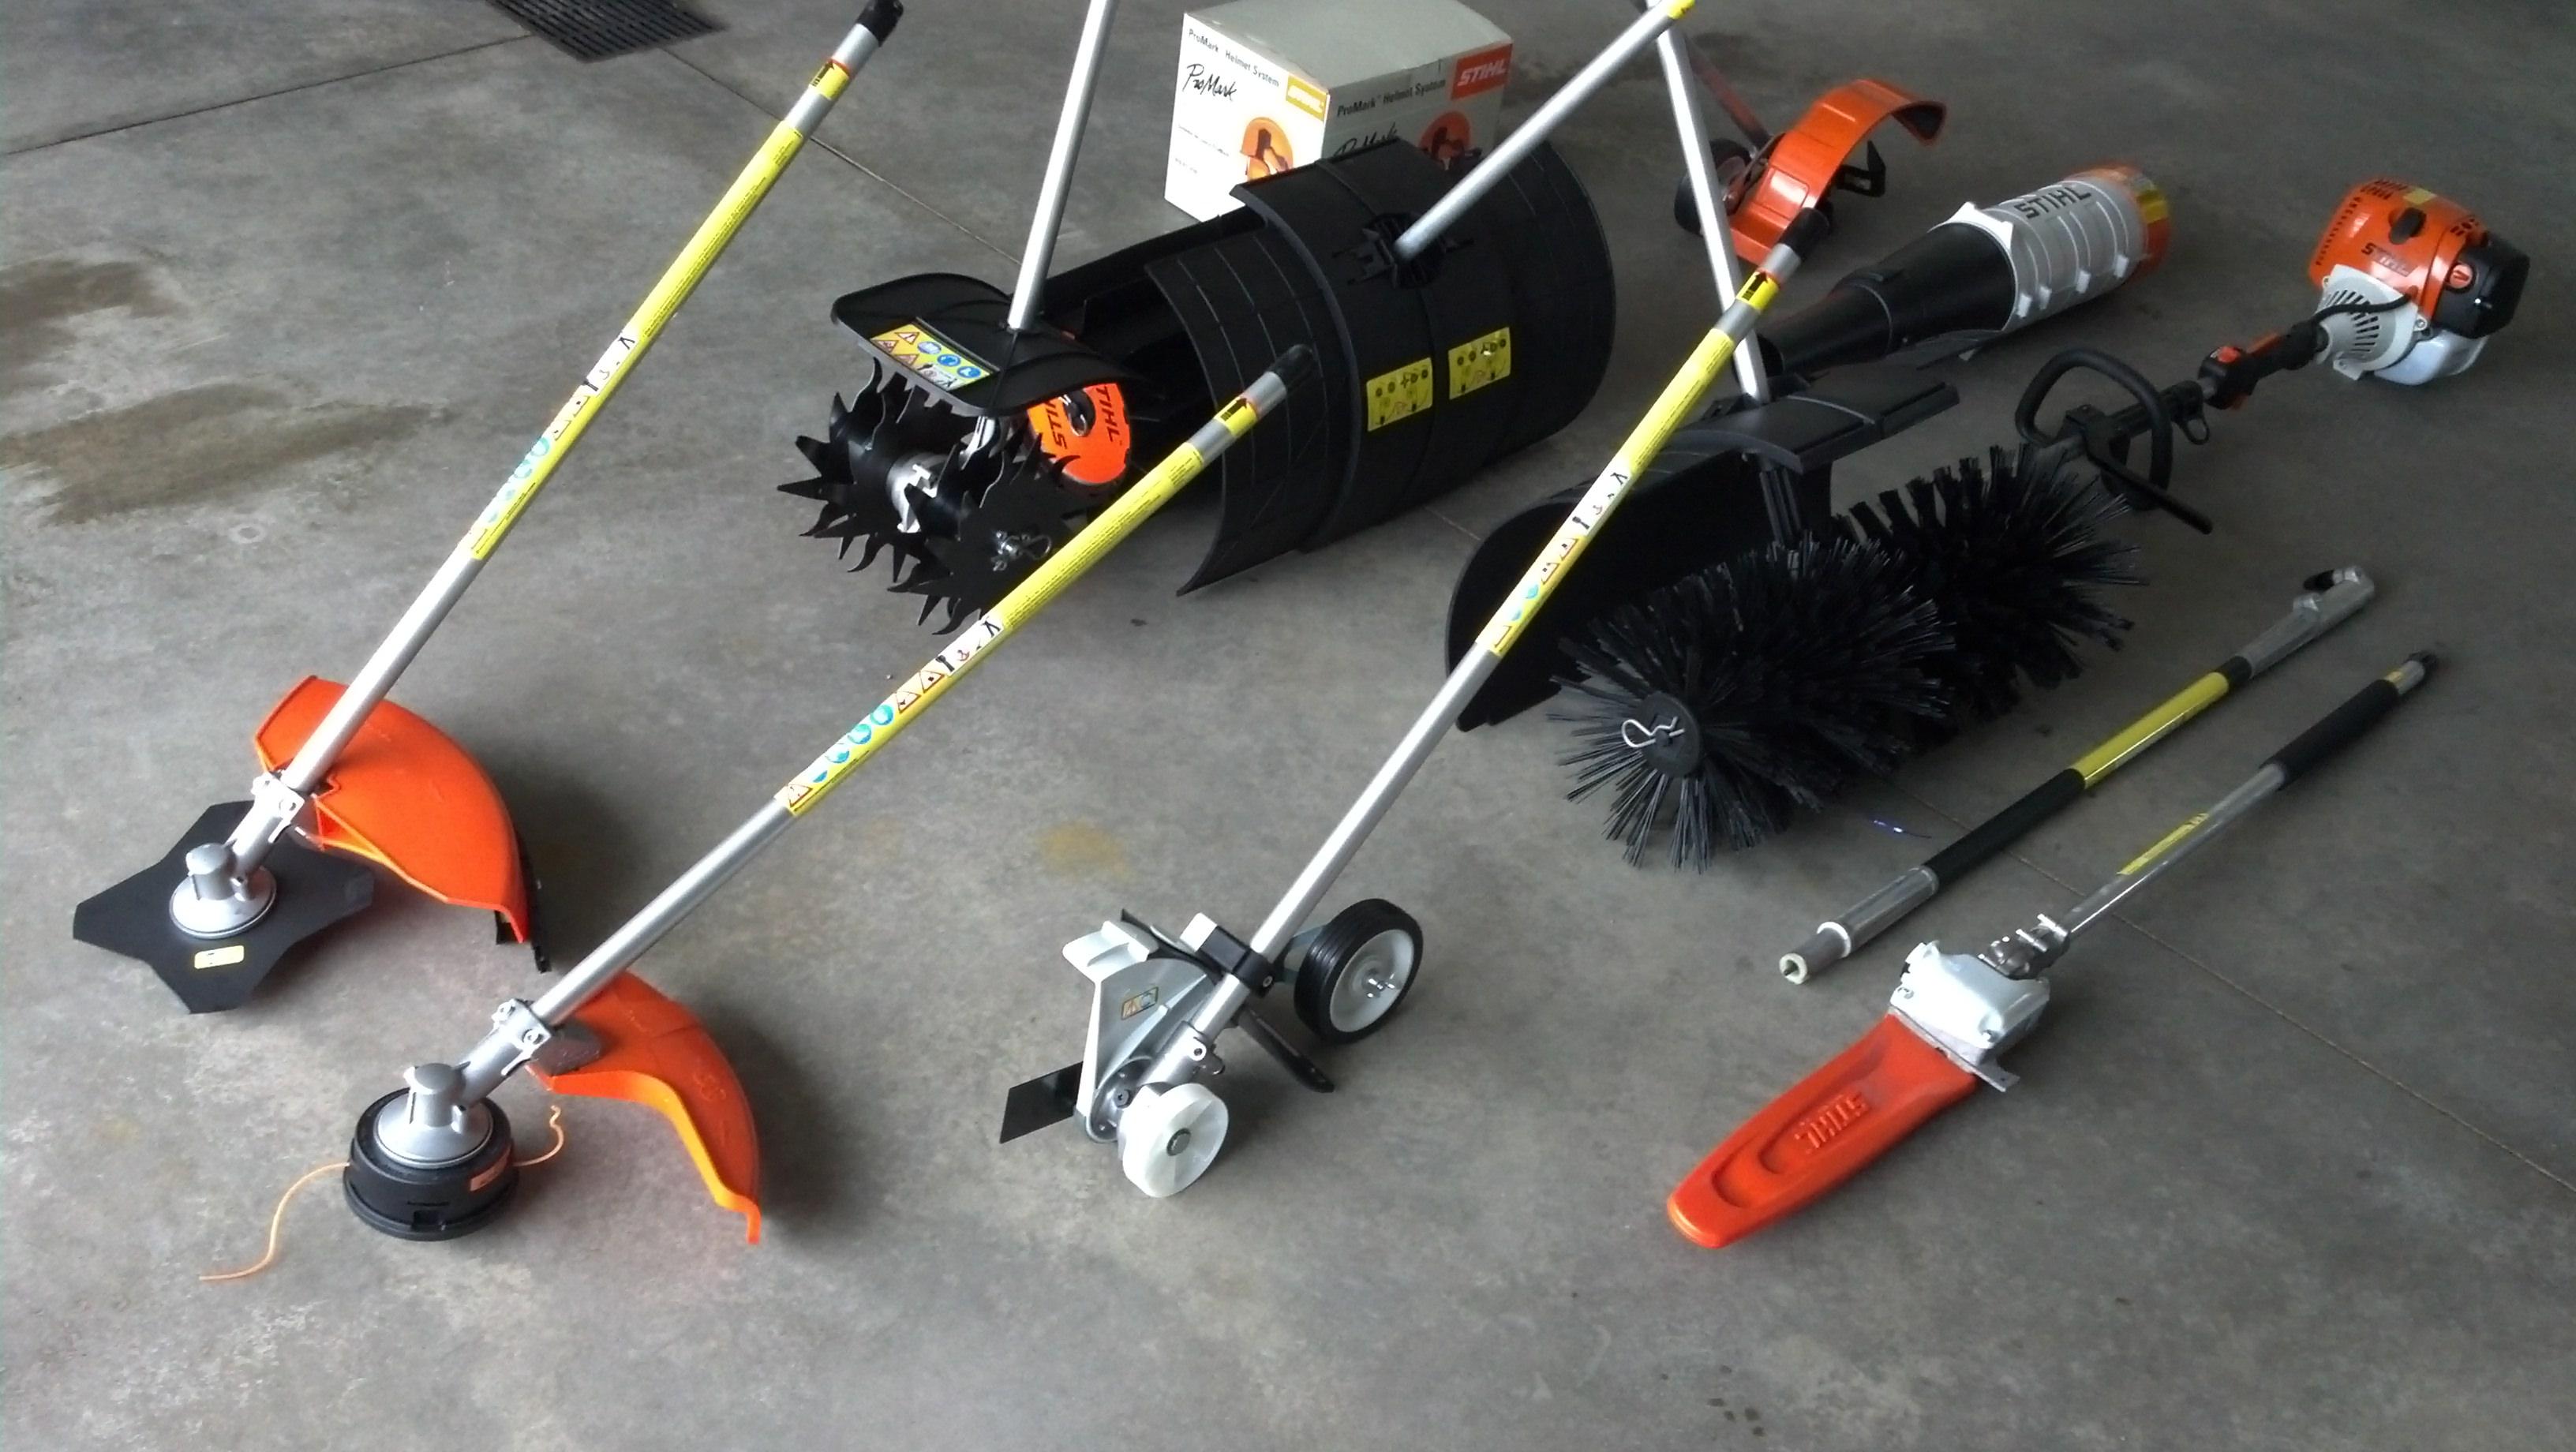 Stihl KM 130 R, KombiSystem and Yard Boss Attachments